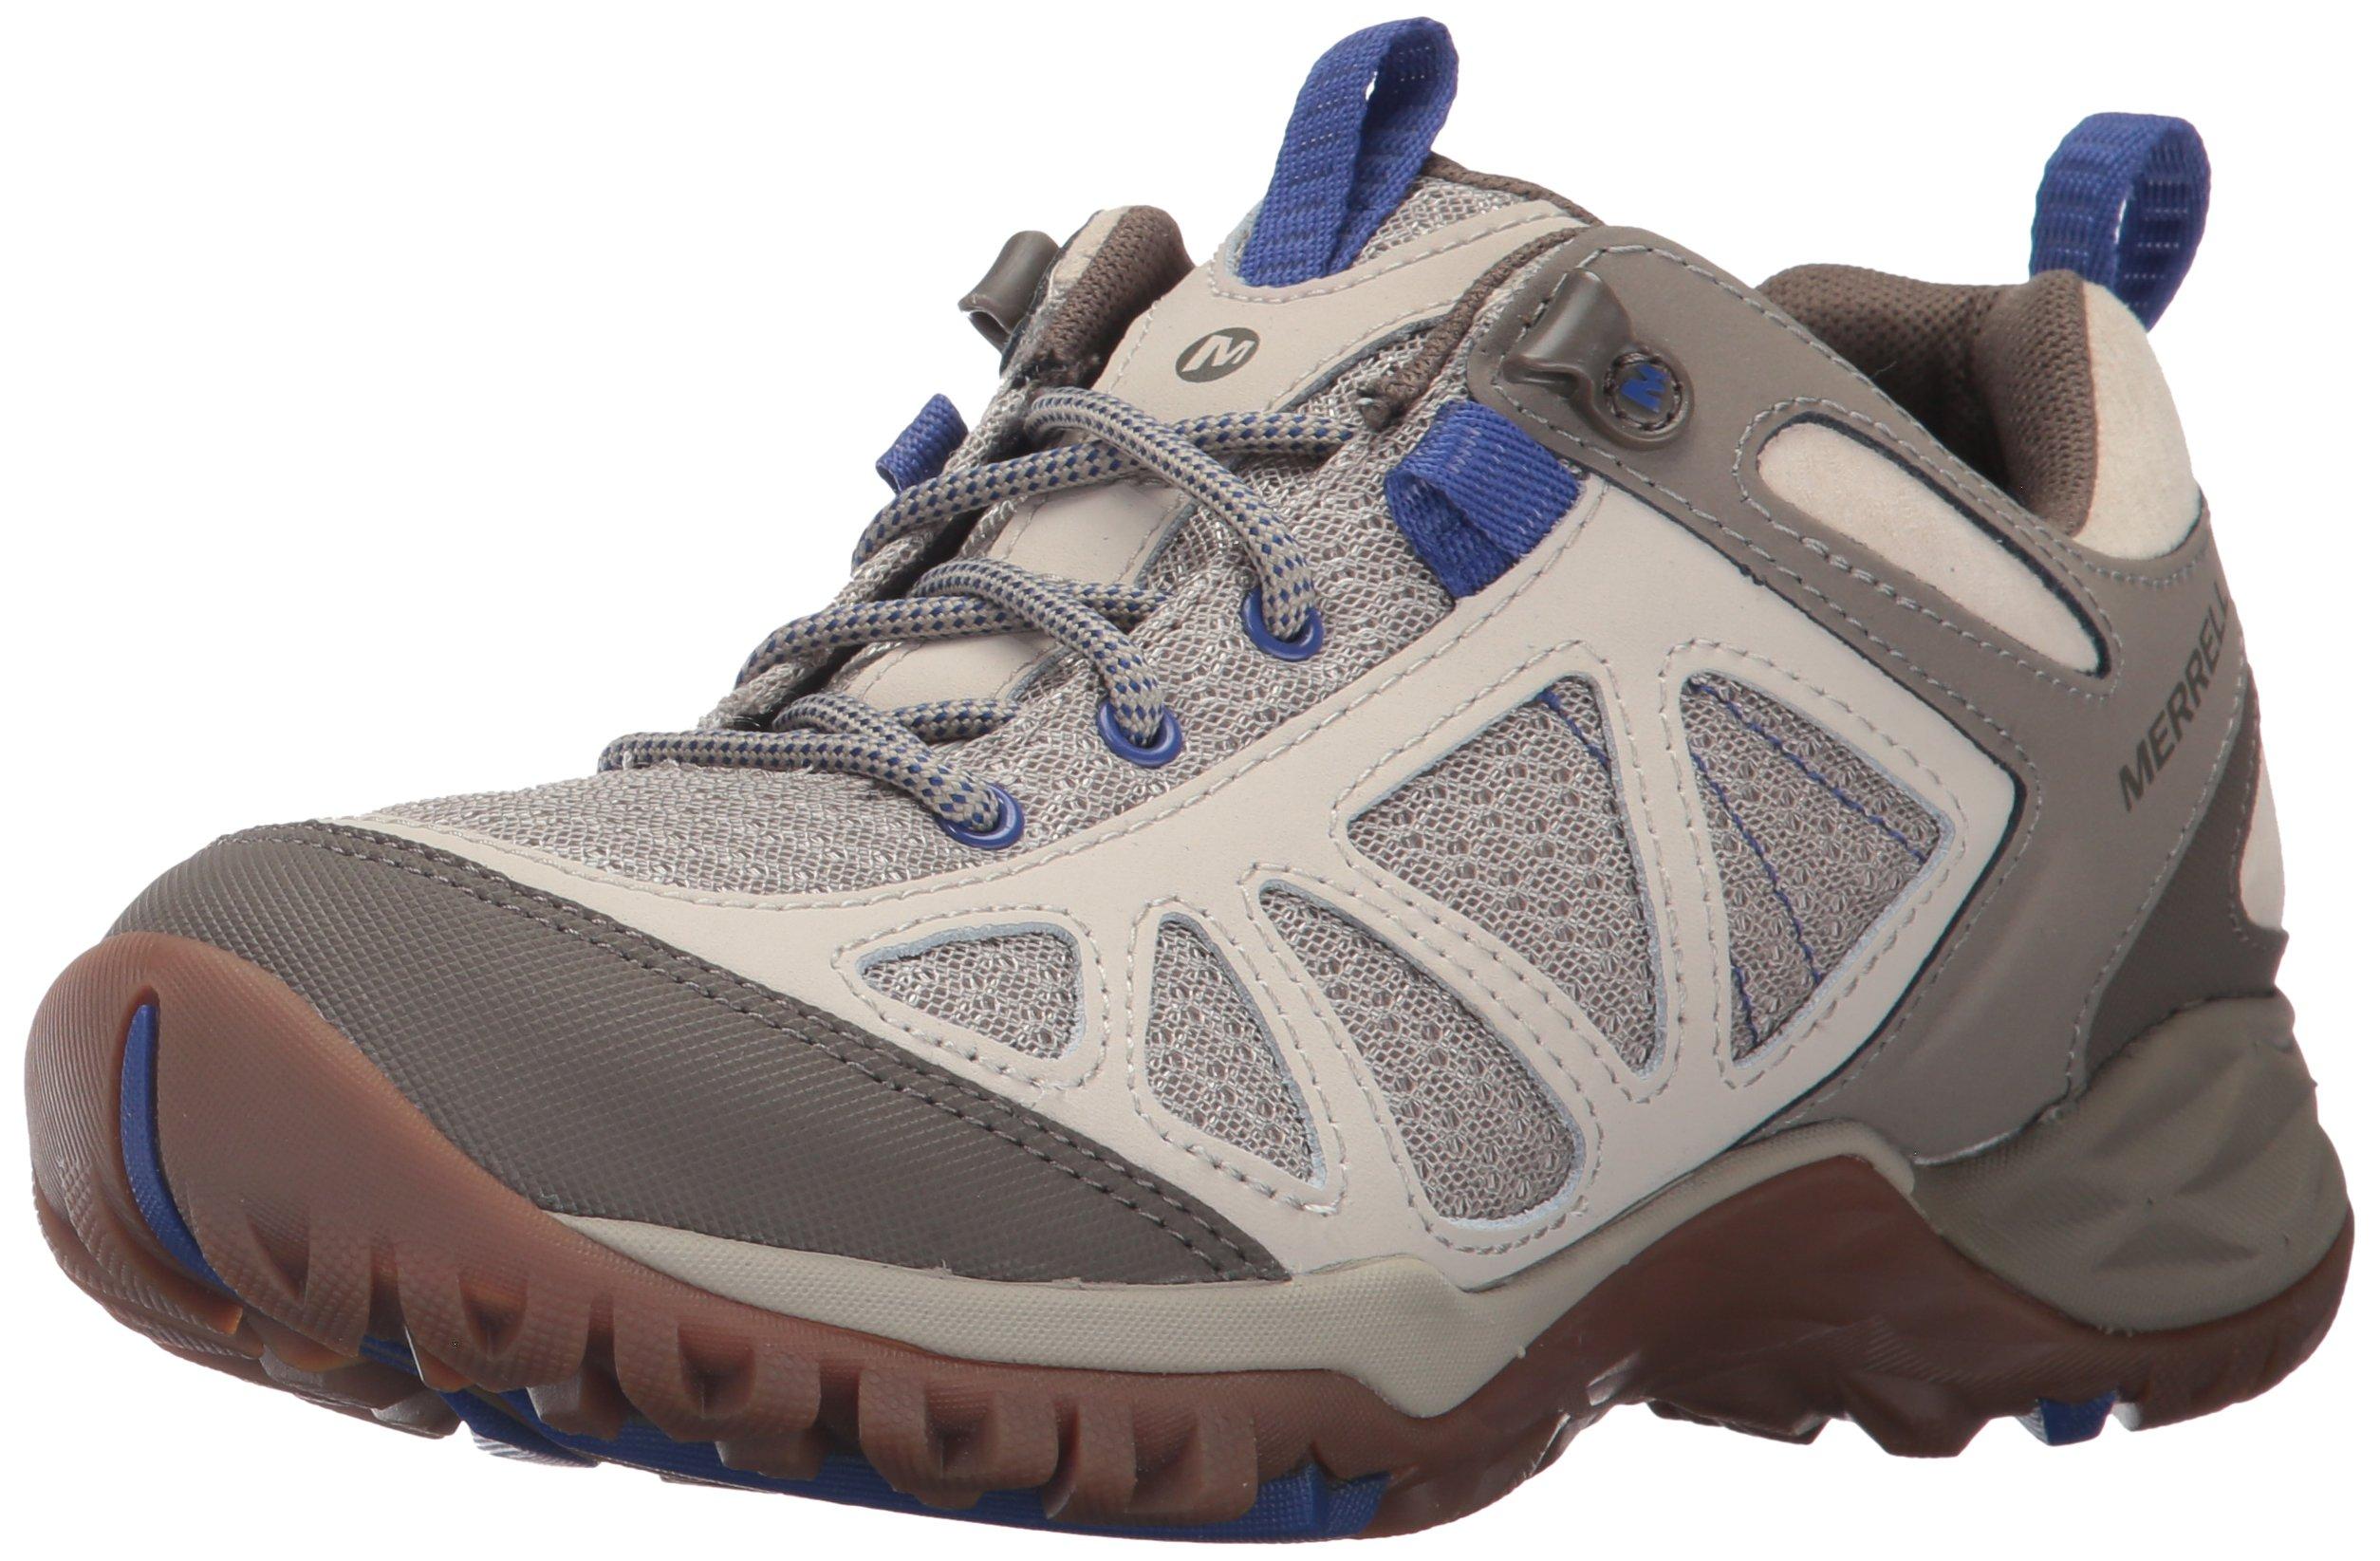 Merrell Women's Siren Sport Q2 Hiking Shoe, Oyster Gery, 11 M US